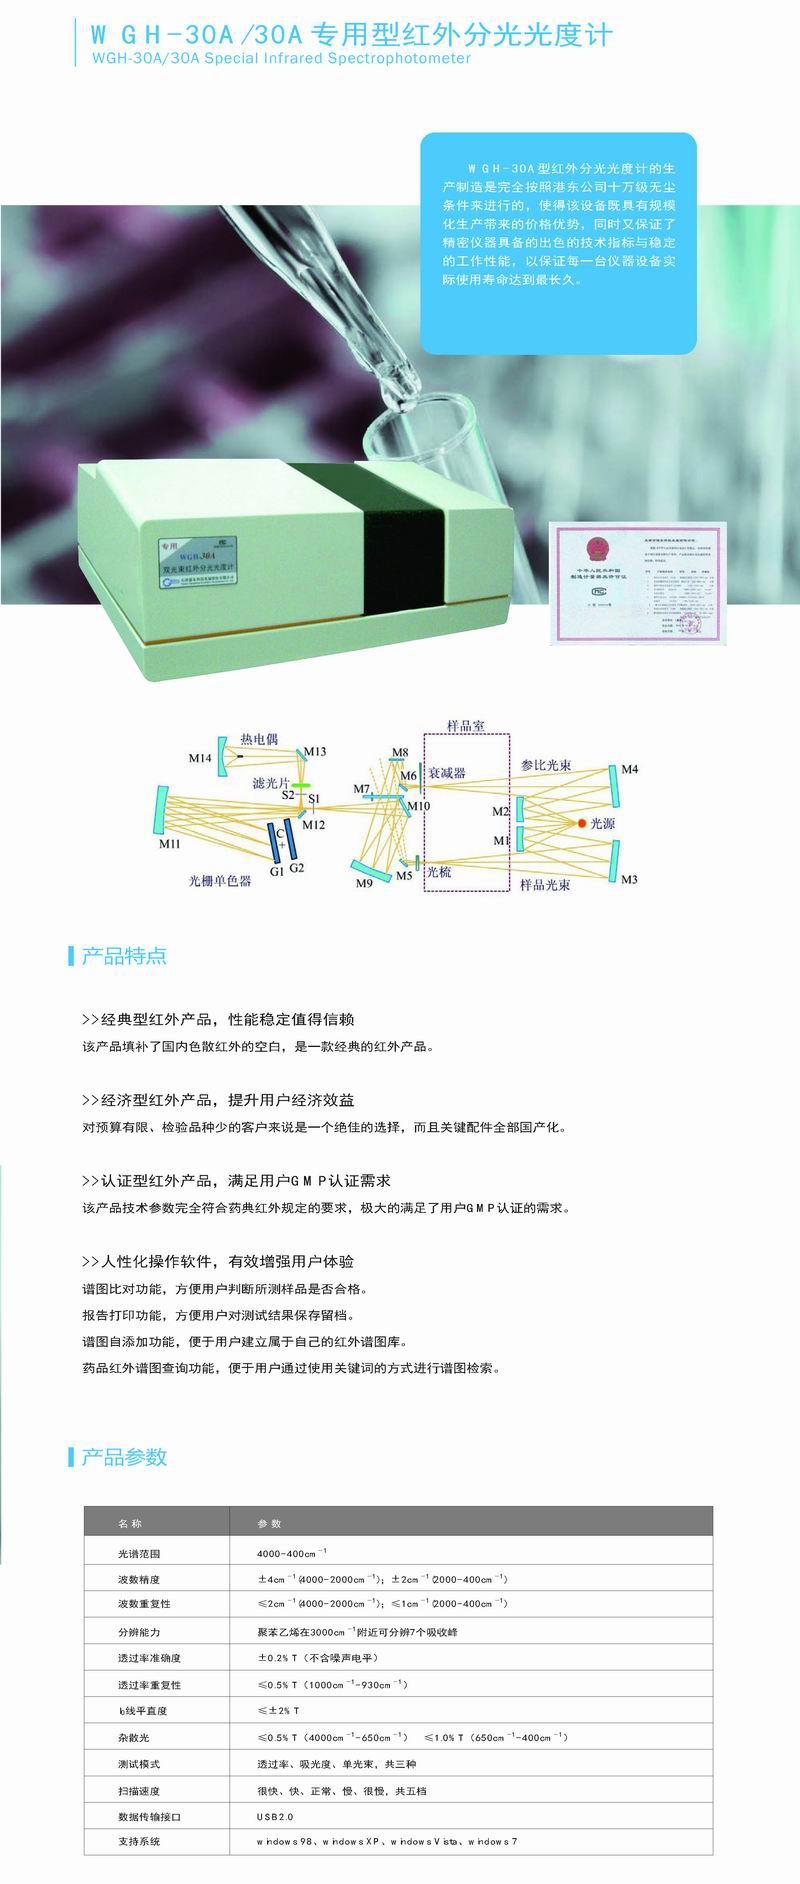 WGH-30A专用型红外分光光度计简介